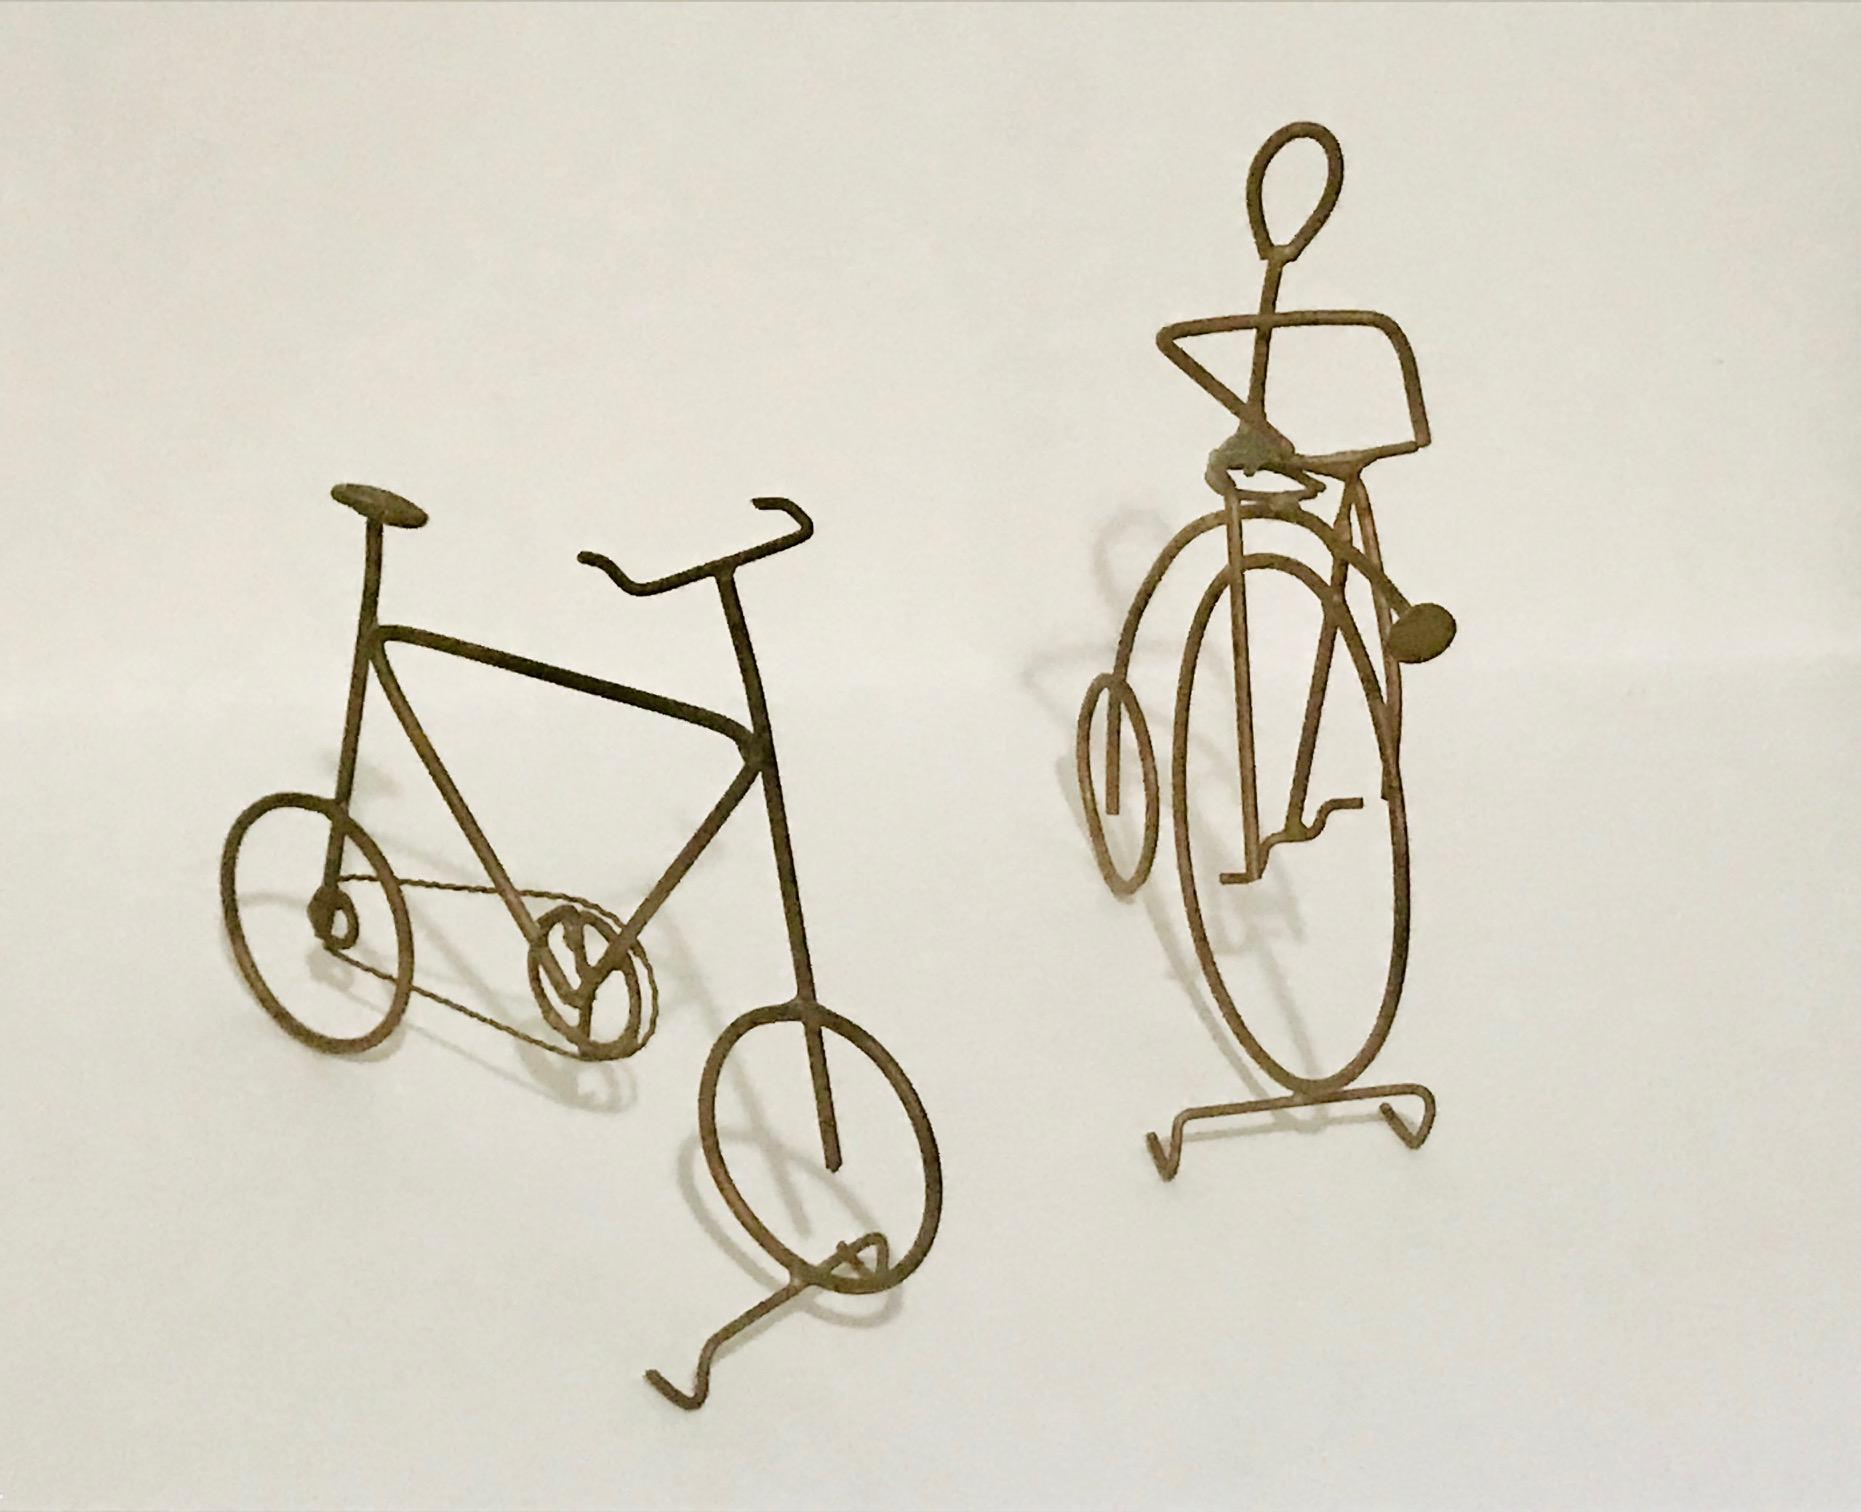 Frank Marrari,  Bicycle pair , steel